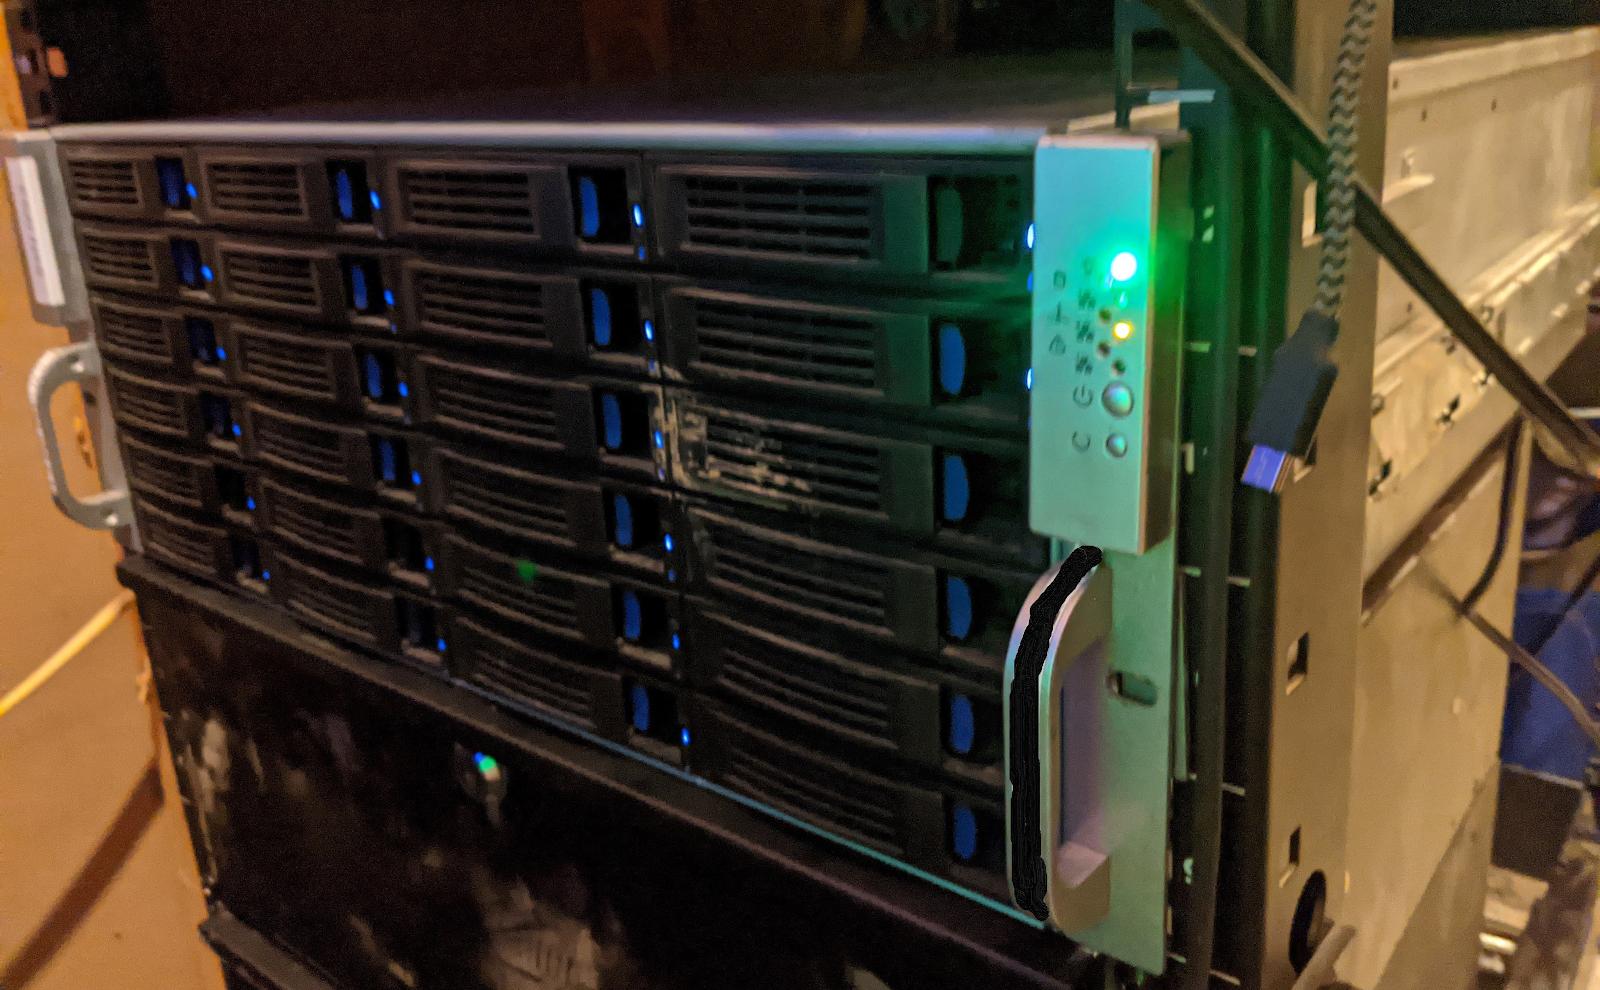 Storage VM: Part 1 – Server Components